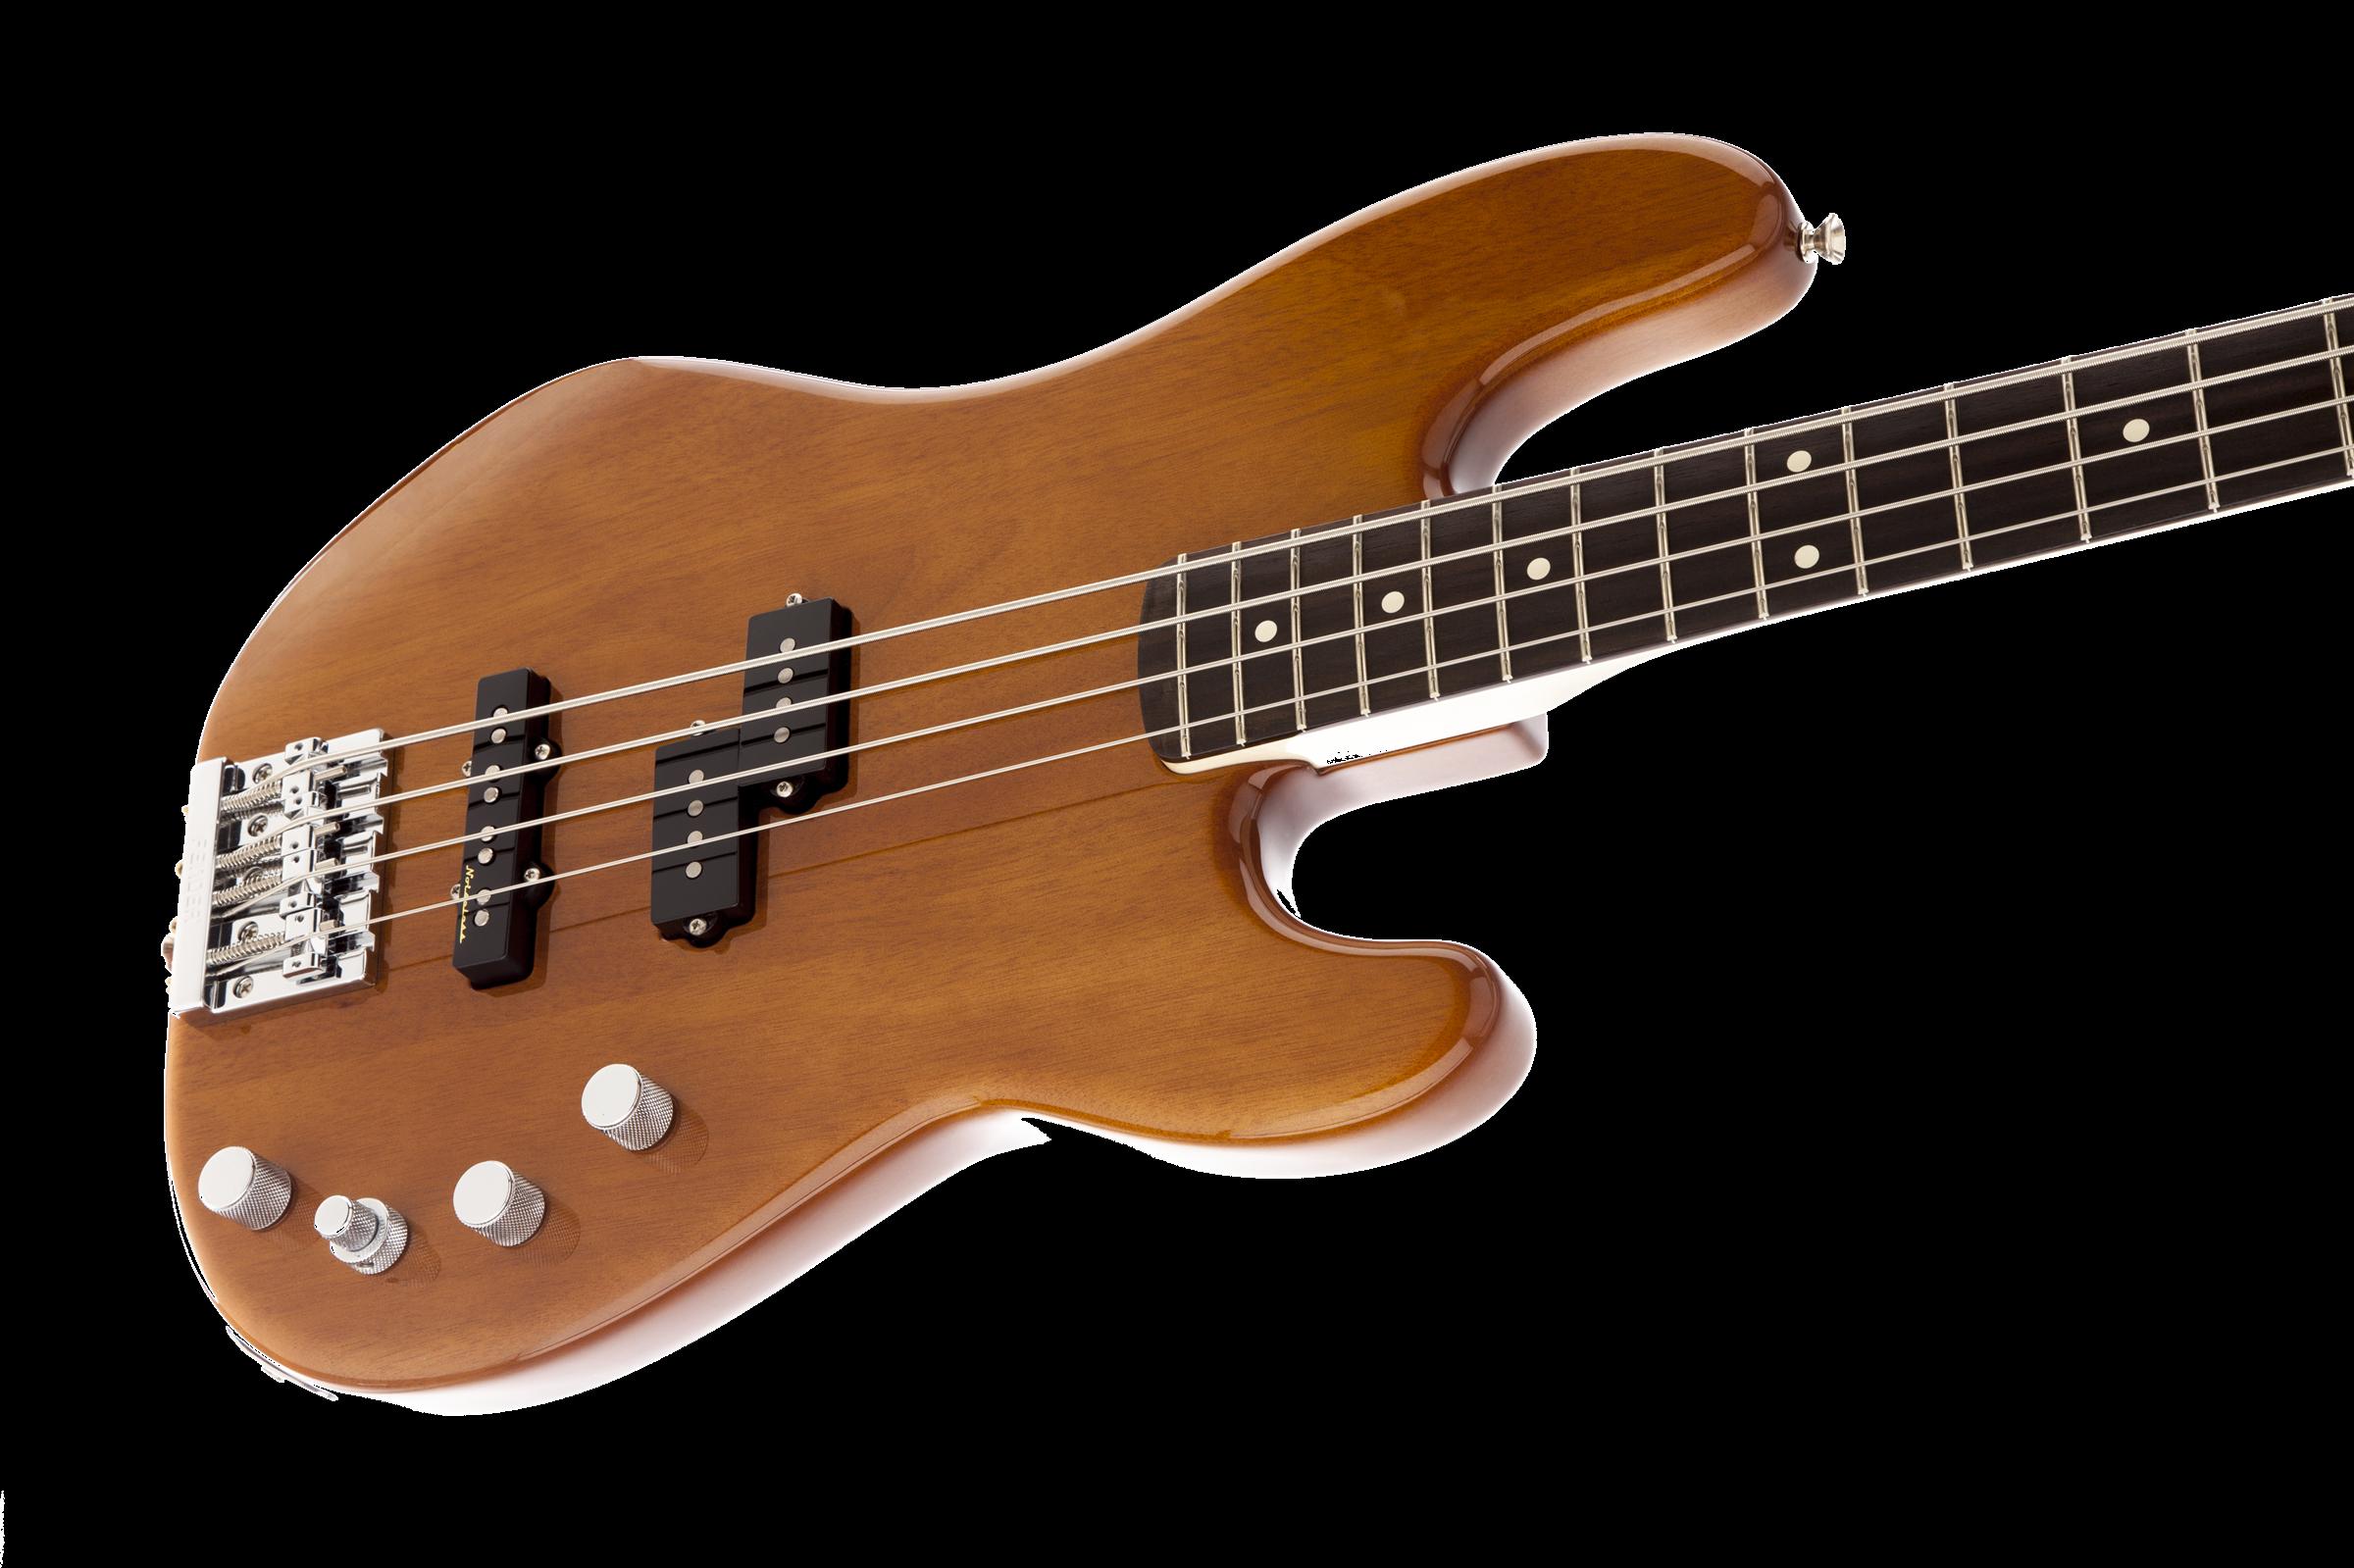 Deluxe Active Precision Bass® Special Okoume | Precision Bass® Bass Guitars | Fender® Bass Guitars